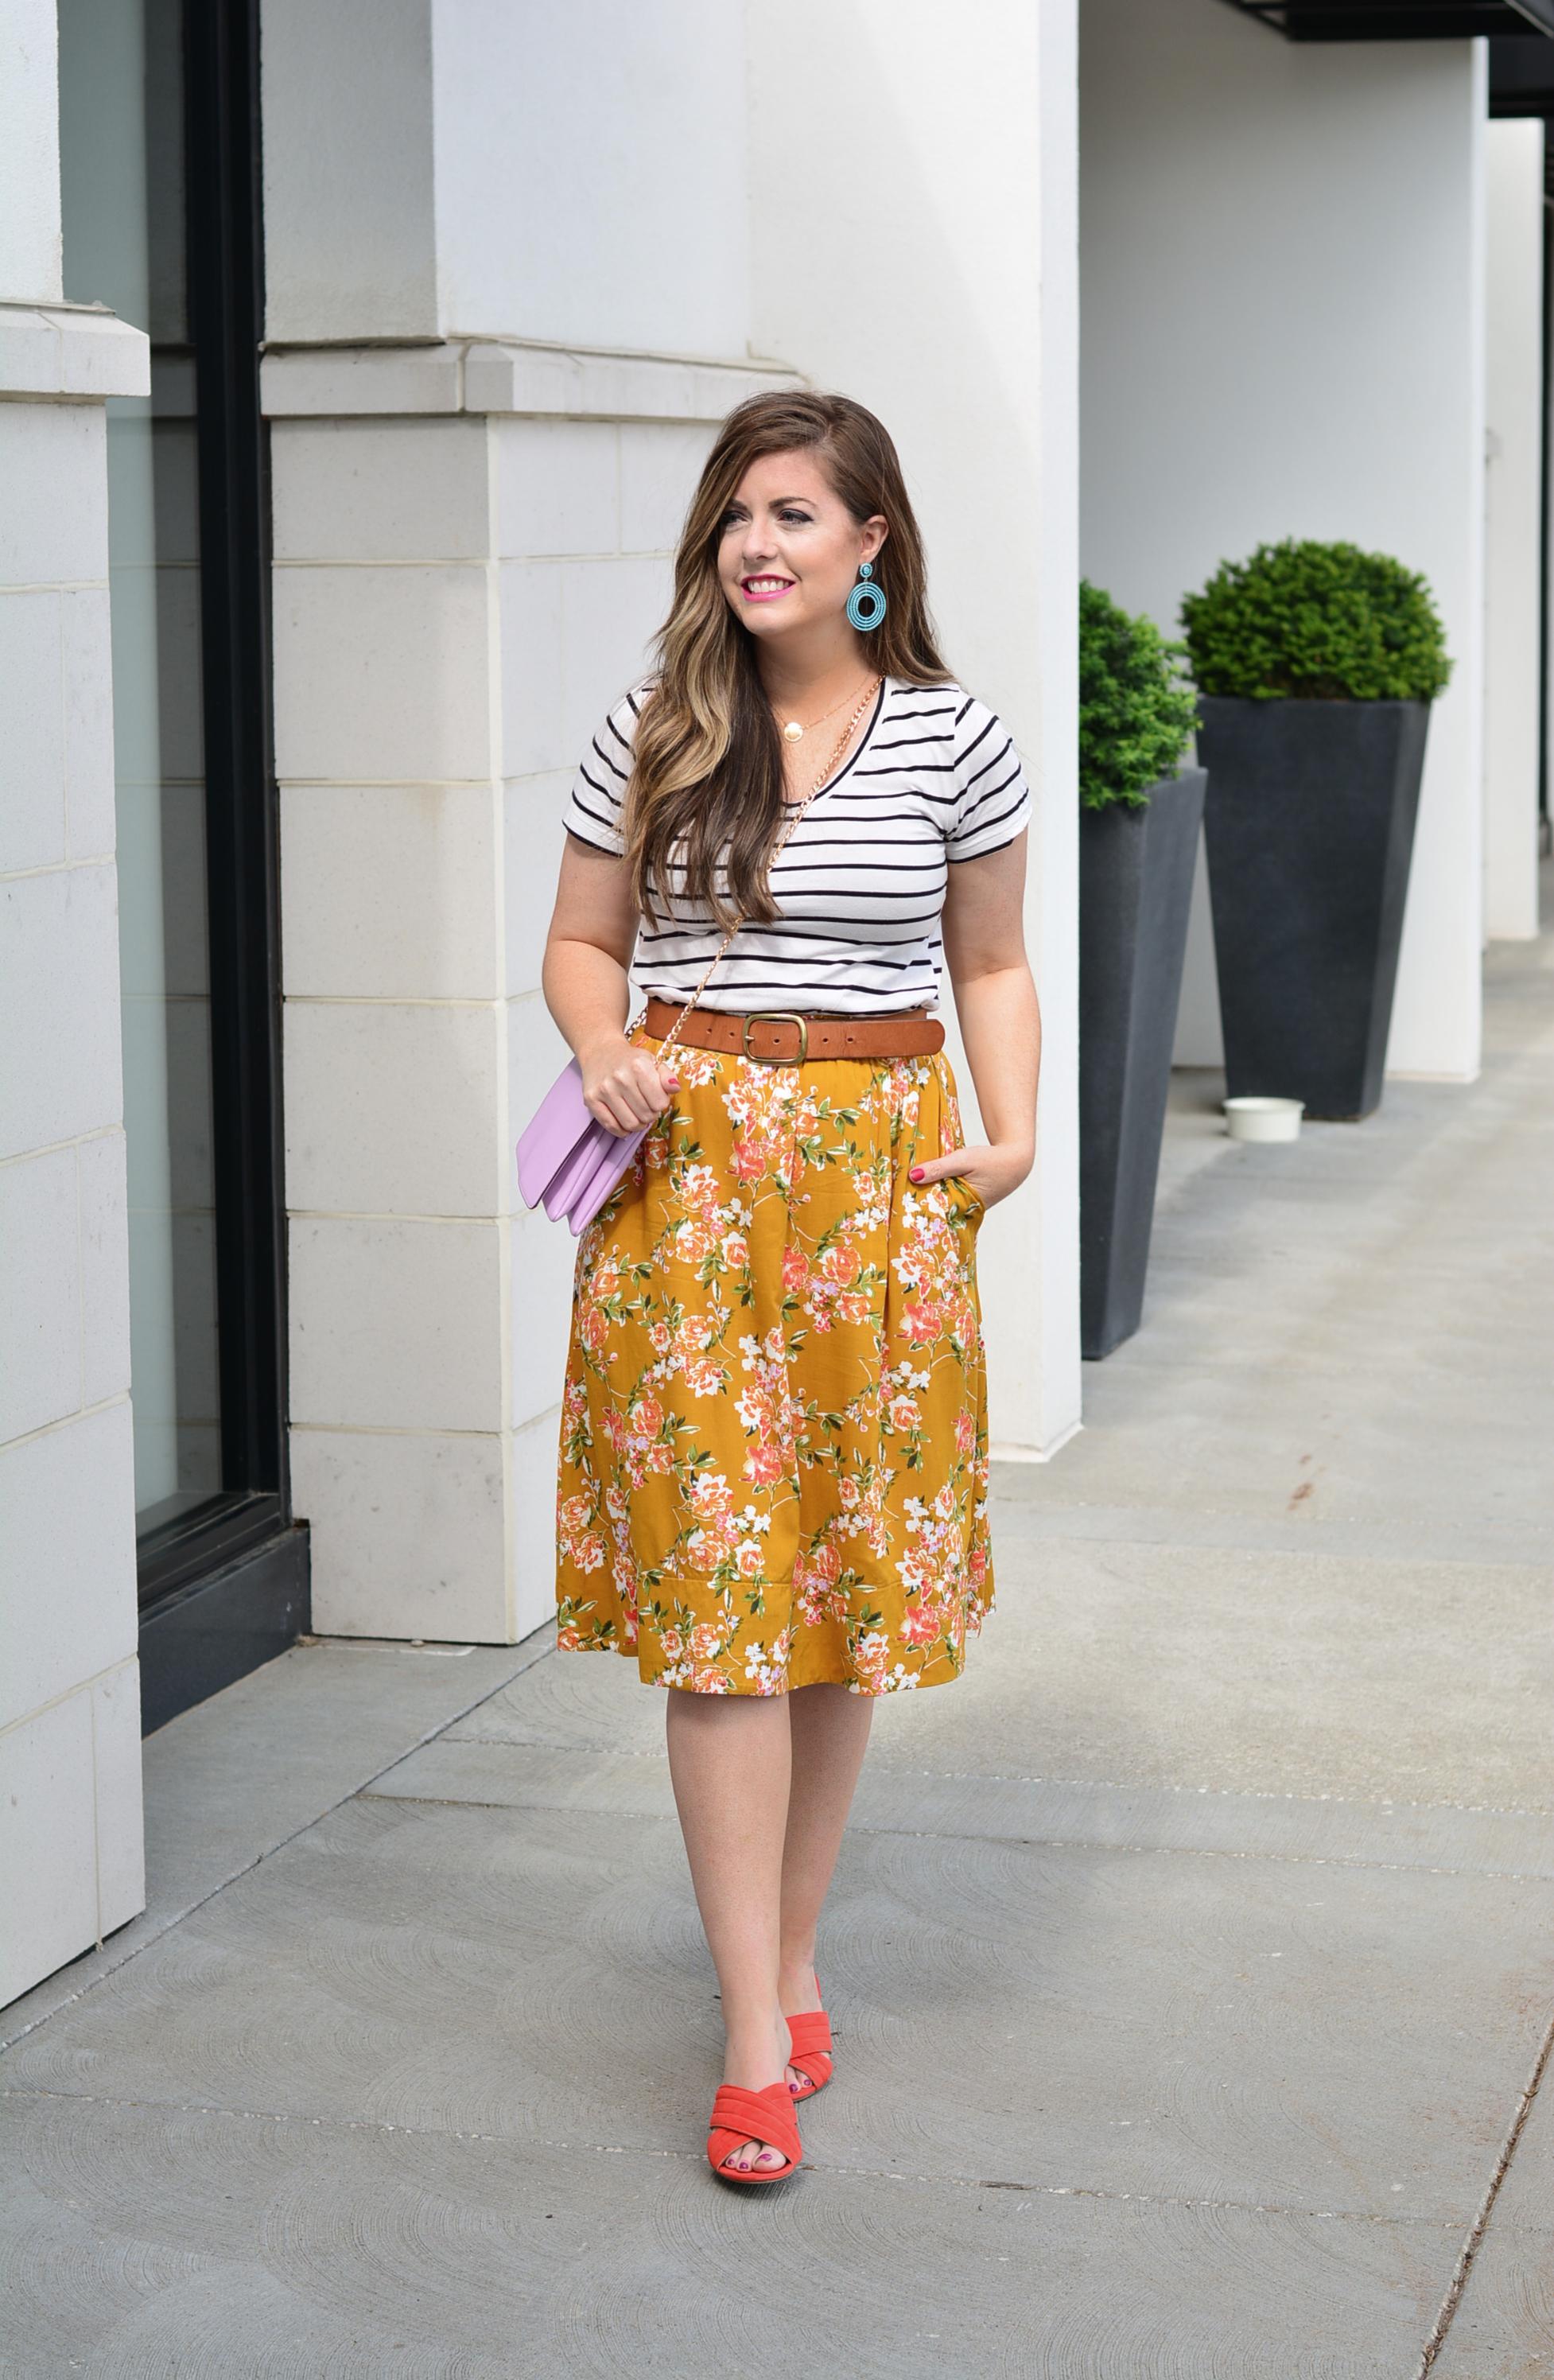 Floral skirt for summer